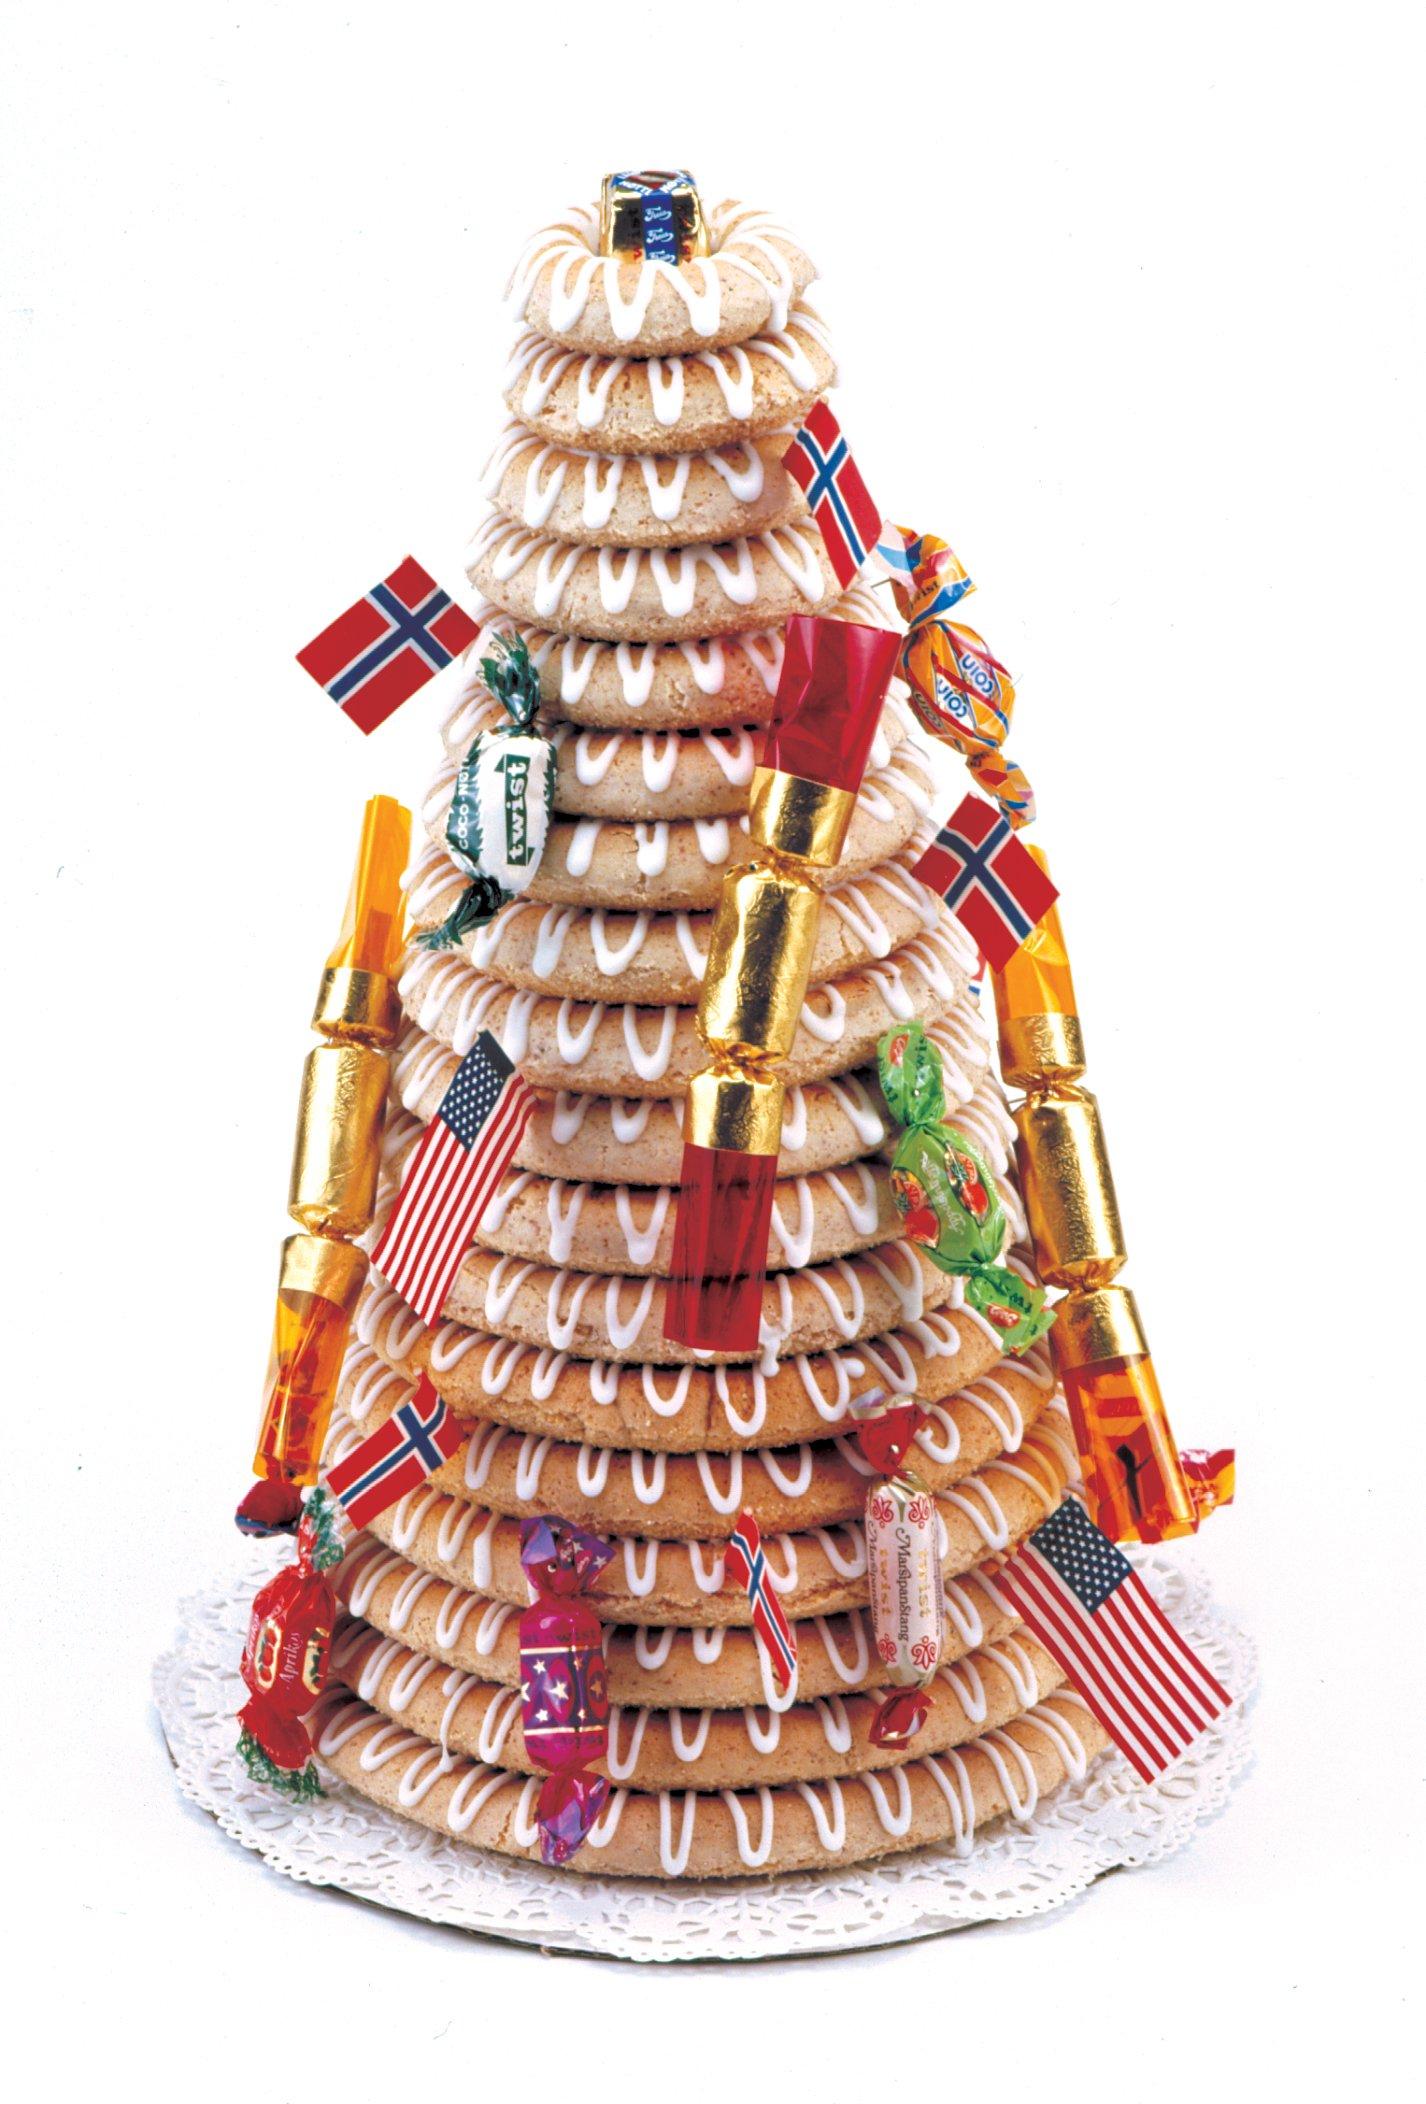 Norpro 3273 Cake Forms Nonstick Kransekake Norwegian Dessert Ring Tower New 3273